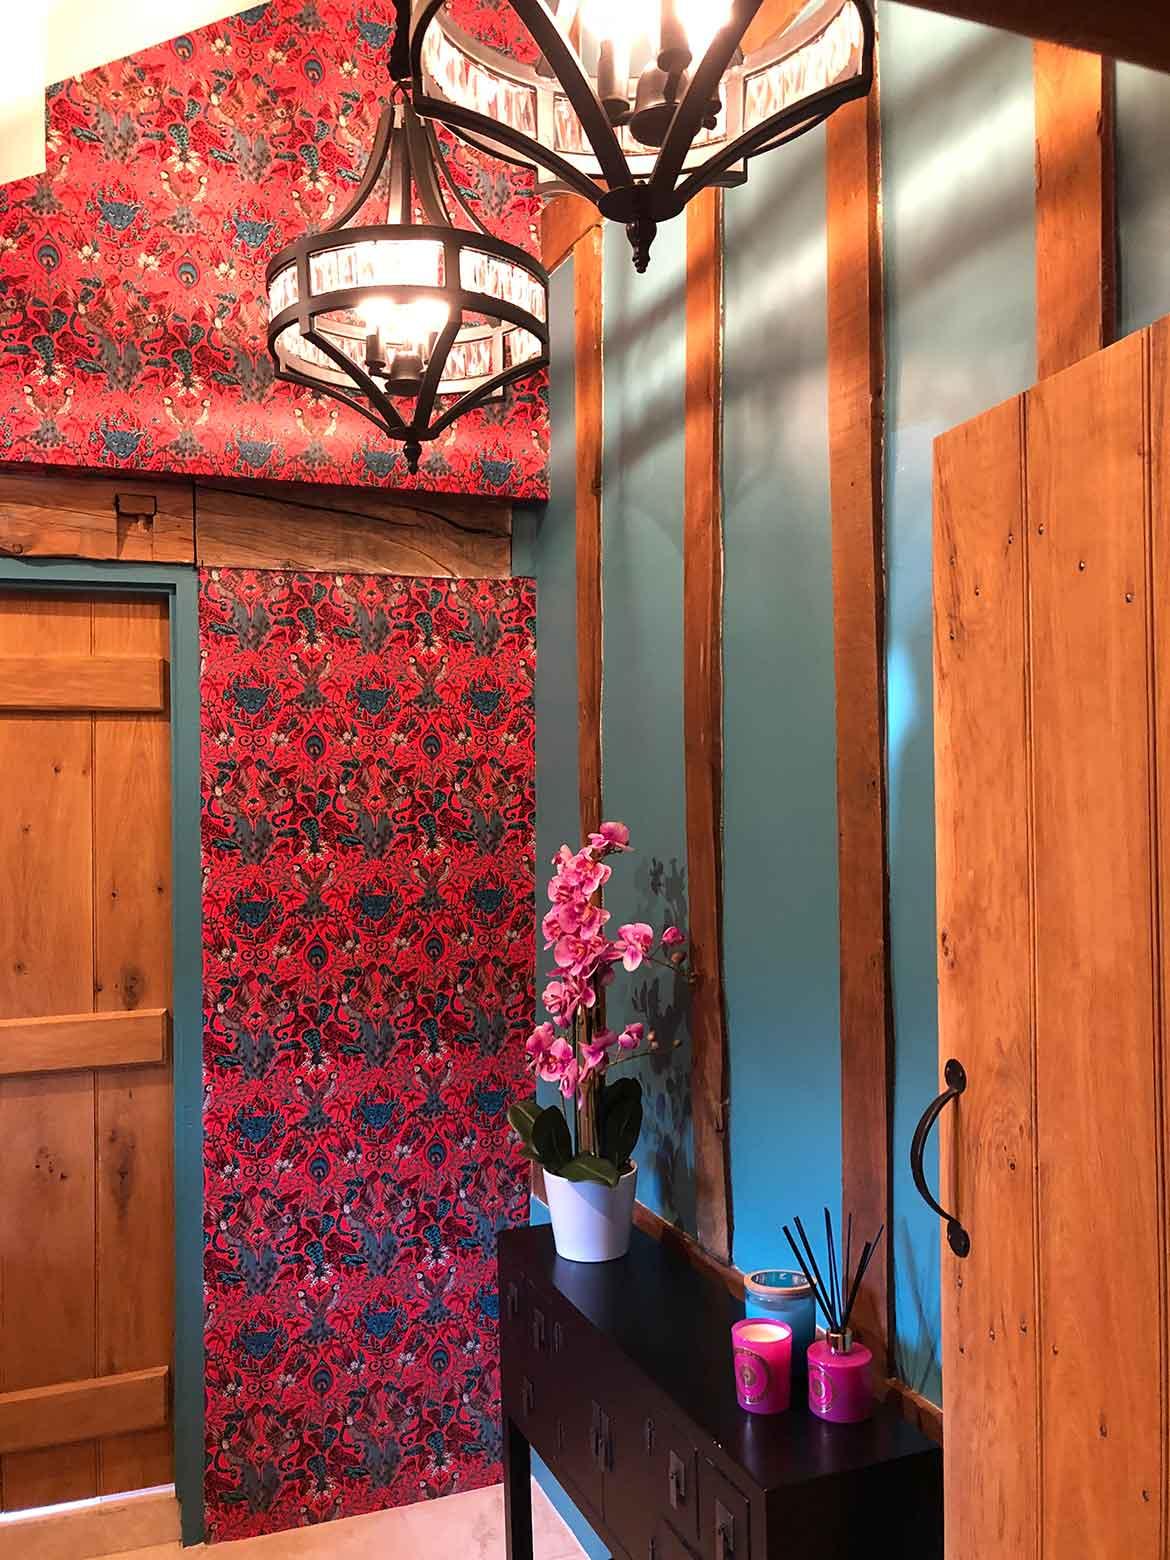 Wallpaper interior design in norfolk